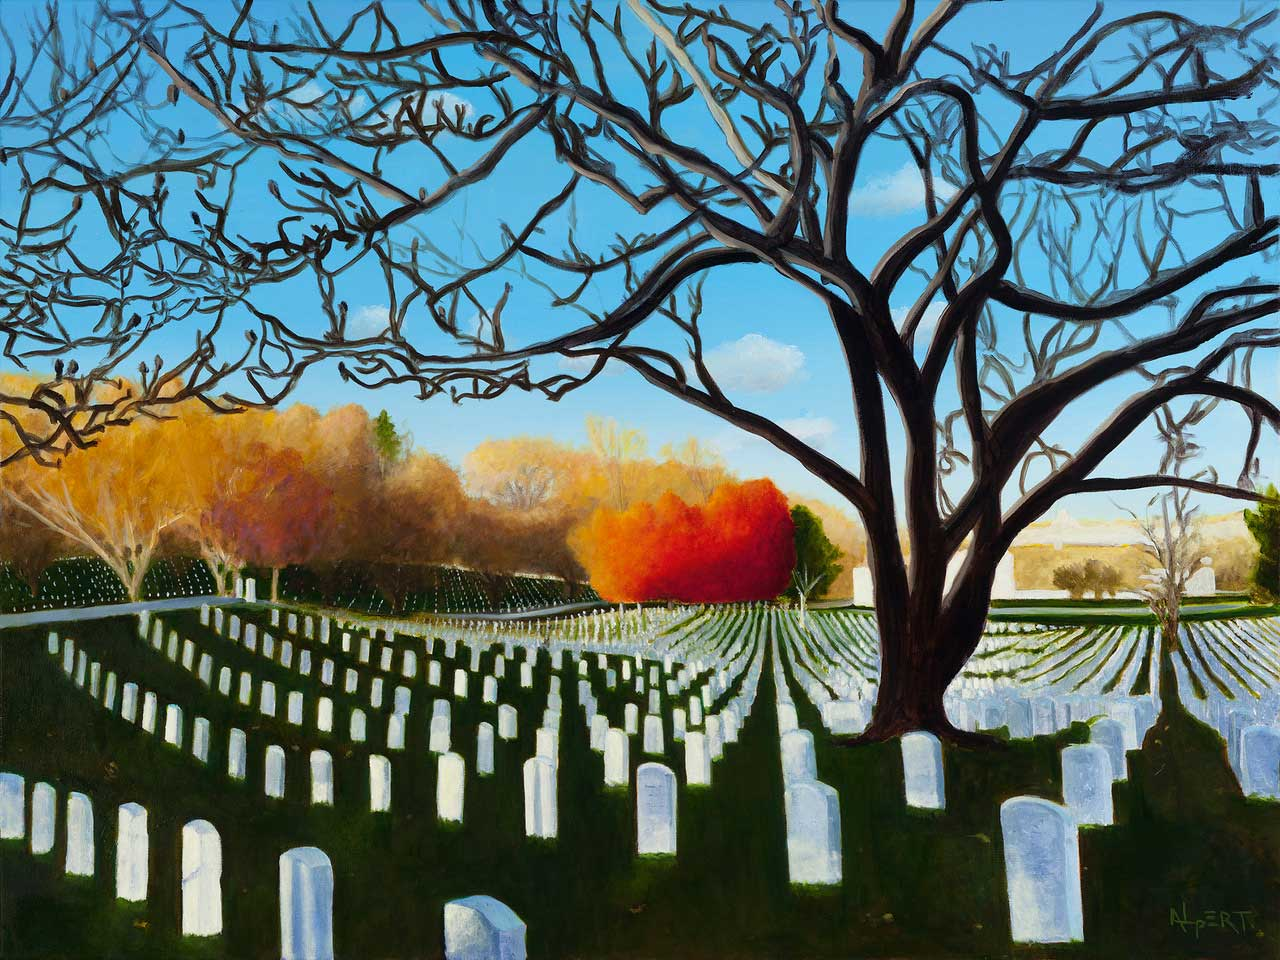 Fields of Honor painting by Steve Alpert.